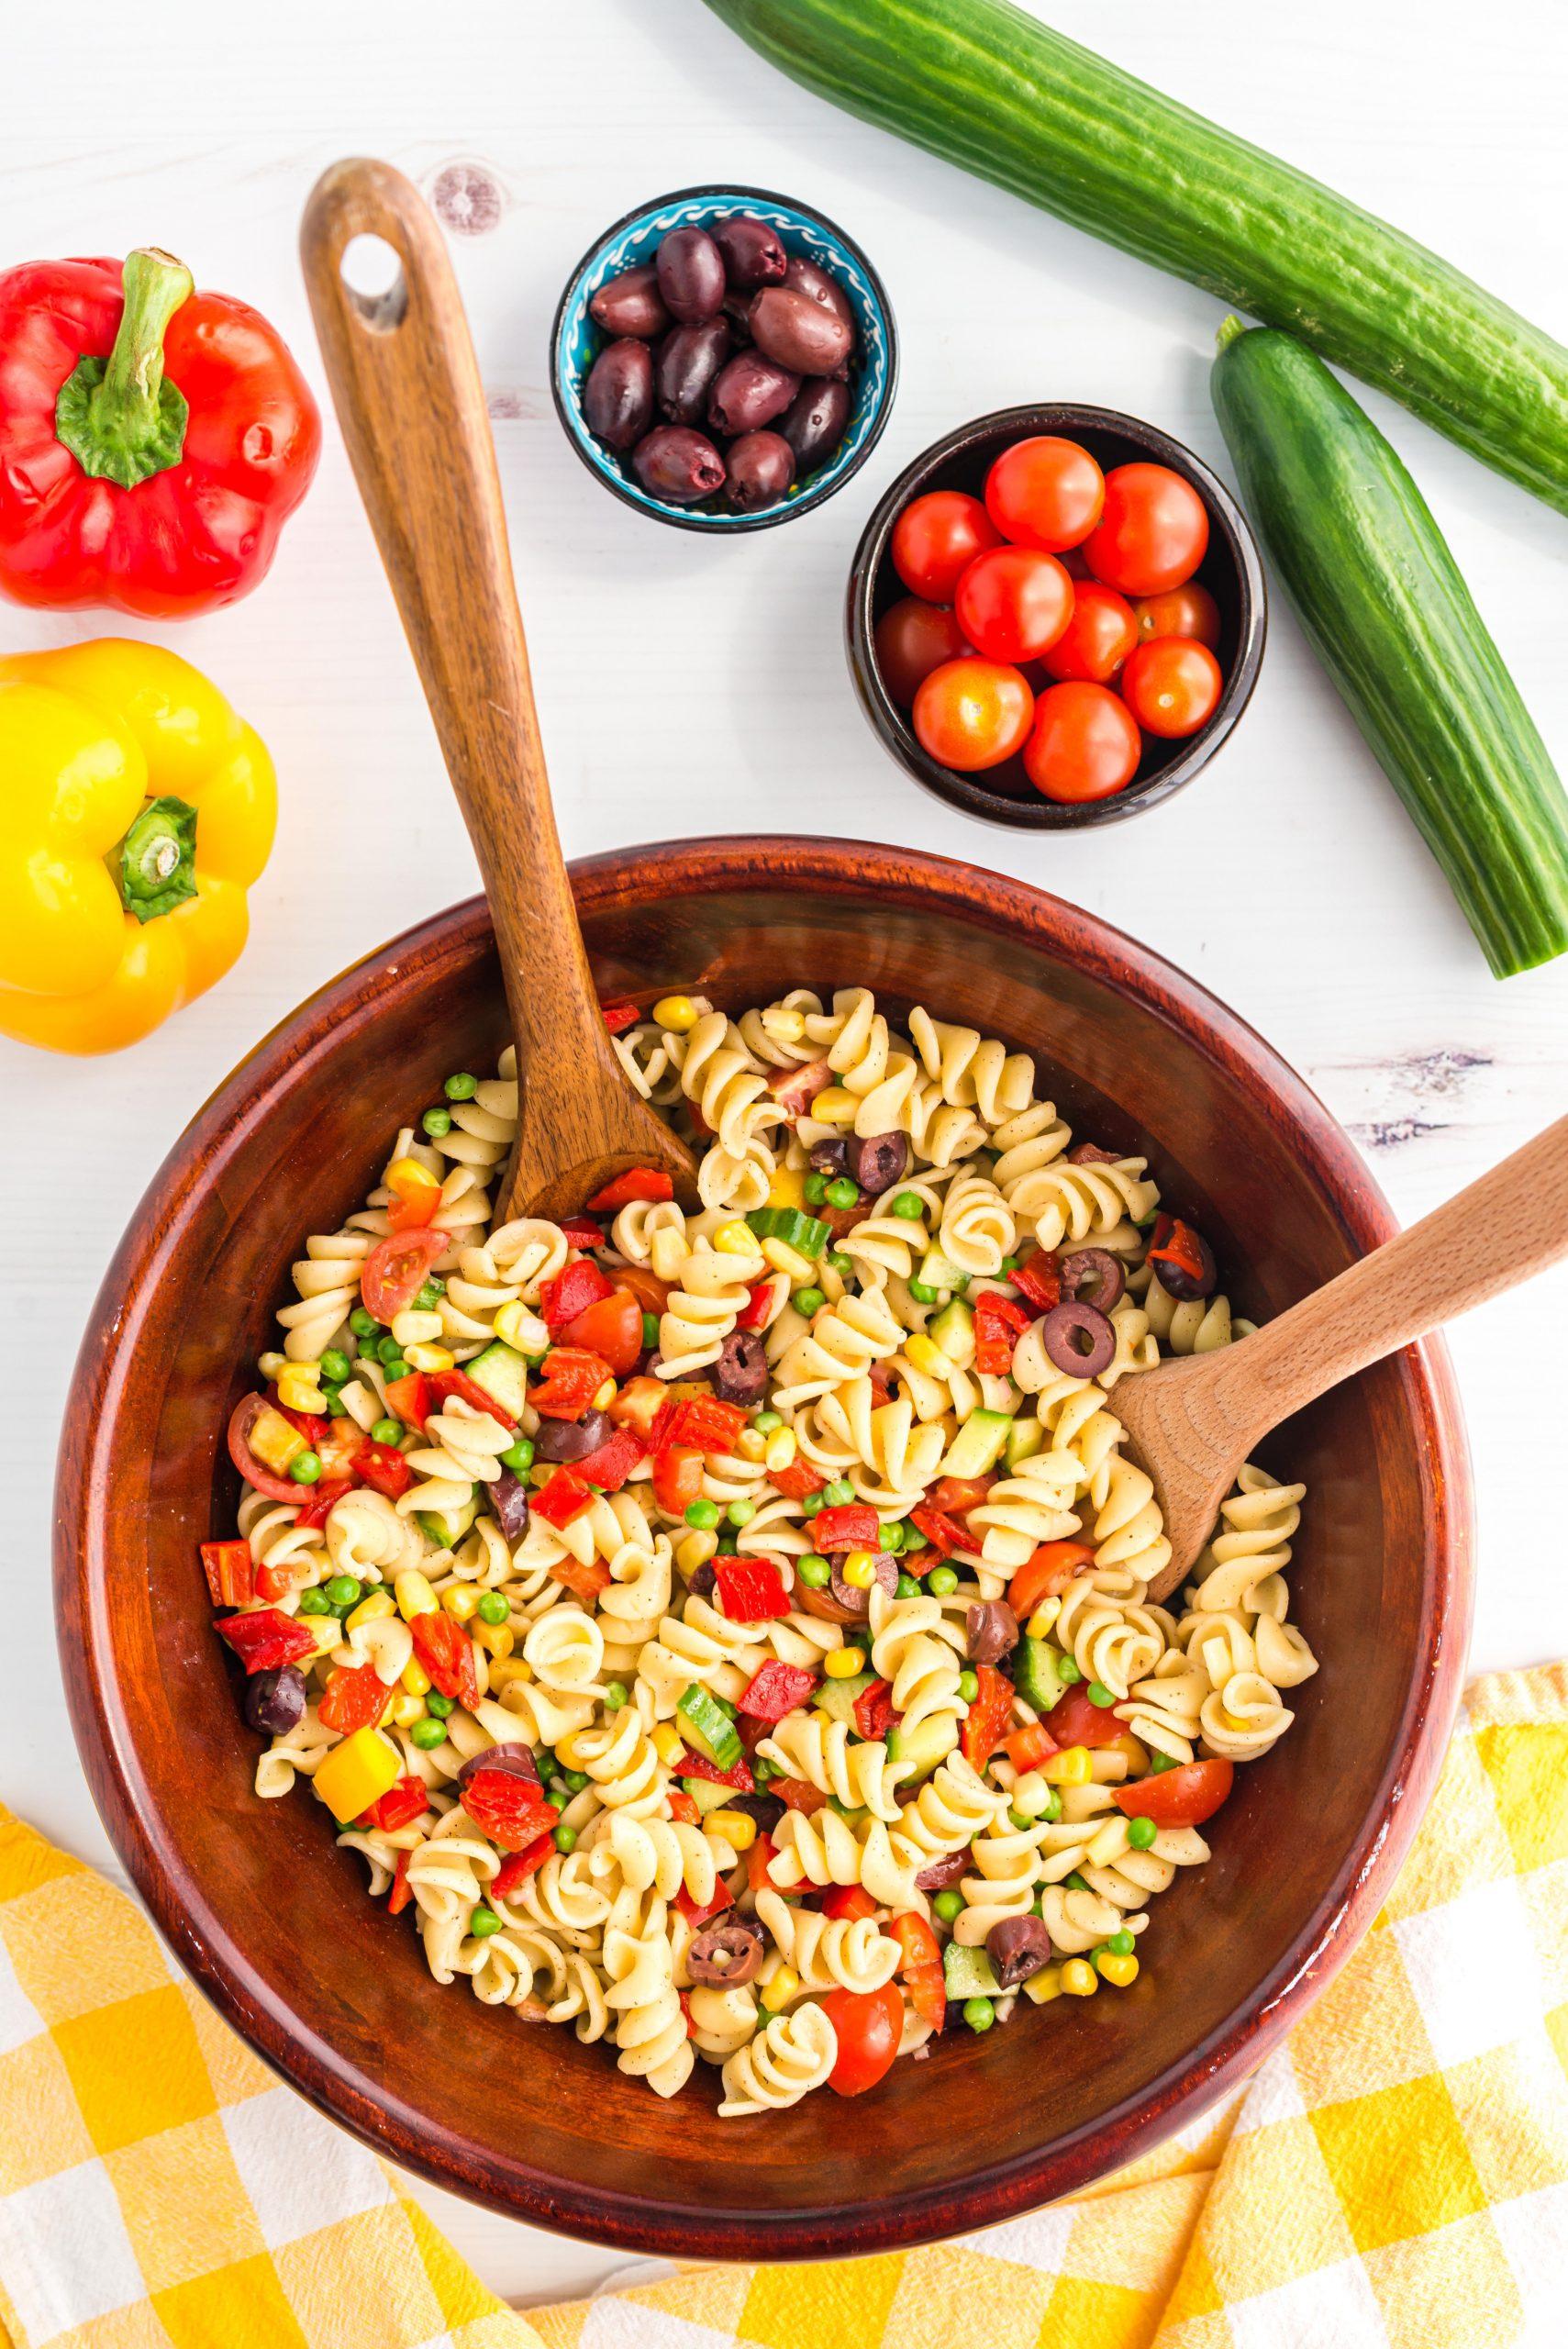 Picnic Pasta Salad photo